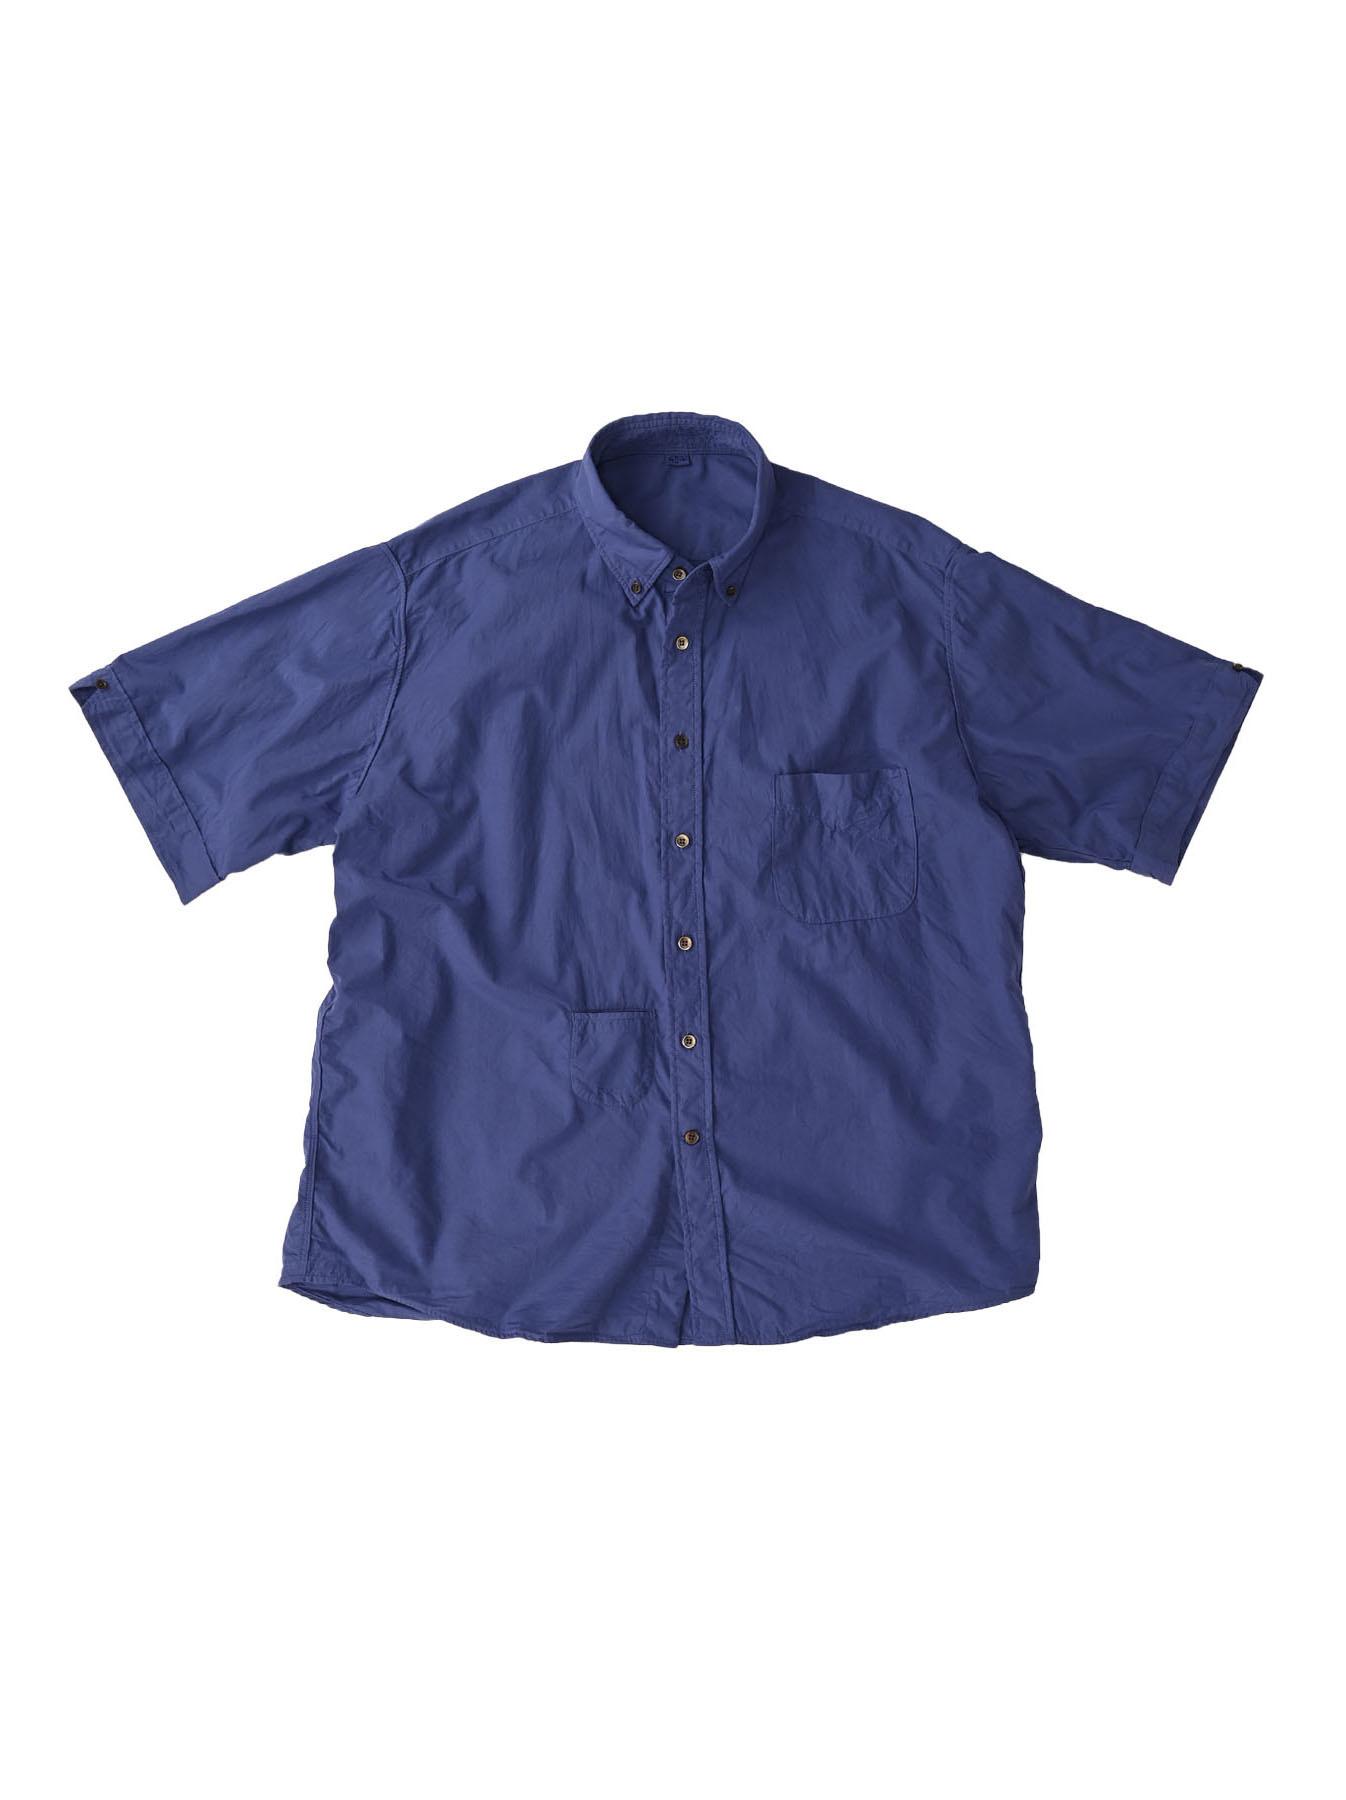 Damp Cotton Anuenue Ocean Shirt (0621)-4